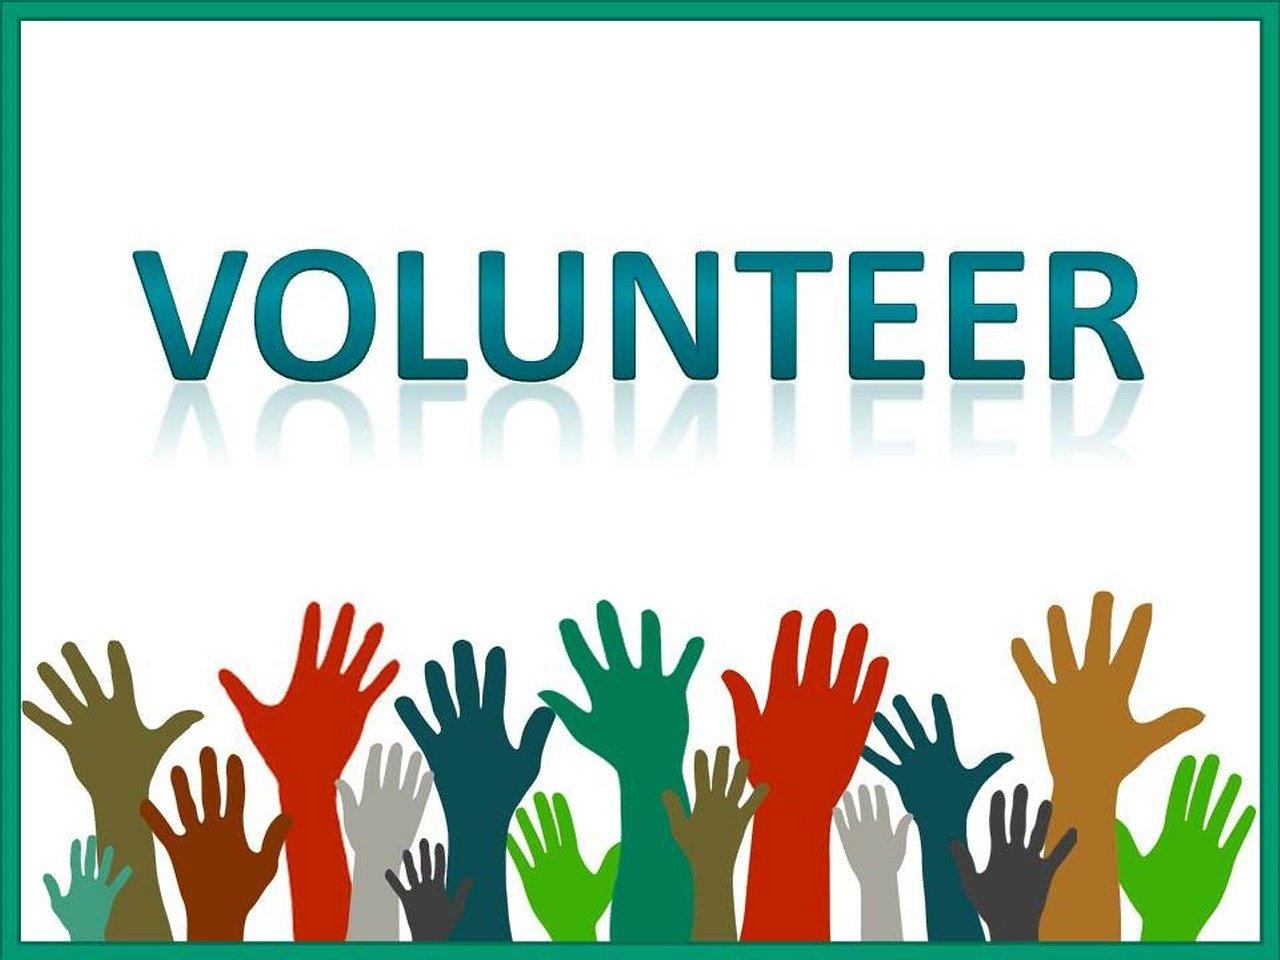 Volunteer Volunteerism - Free image on Pixabay